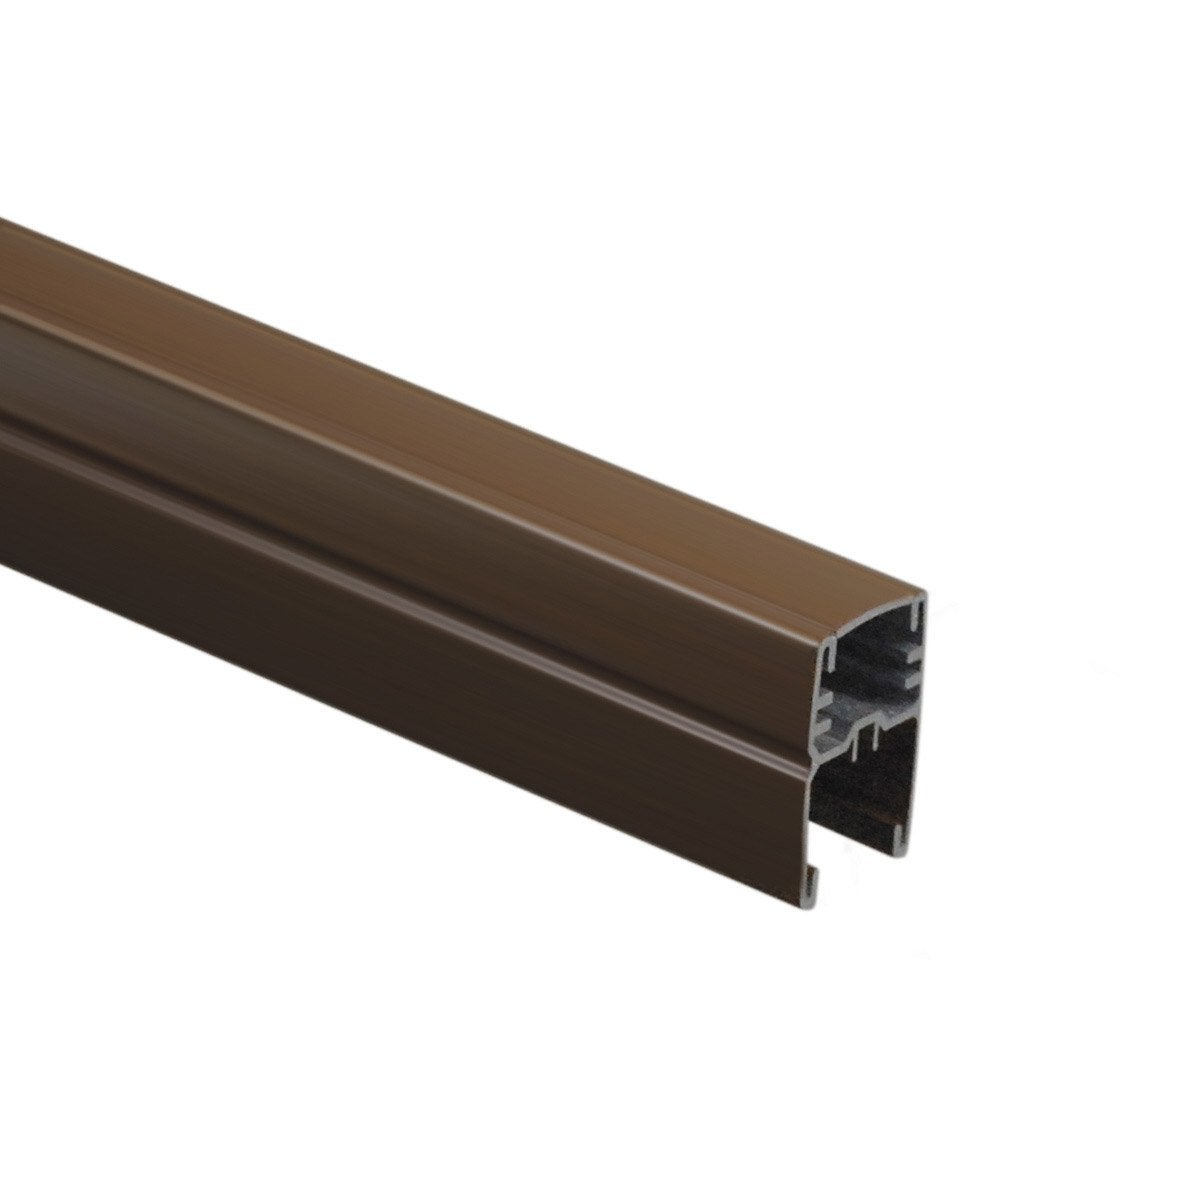 profil de finition aluminium en h premium marron x. Black Bedroom Furniture Sets. Home Design Ideas